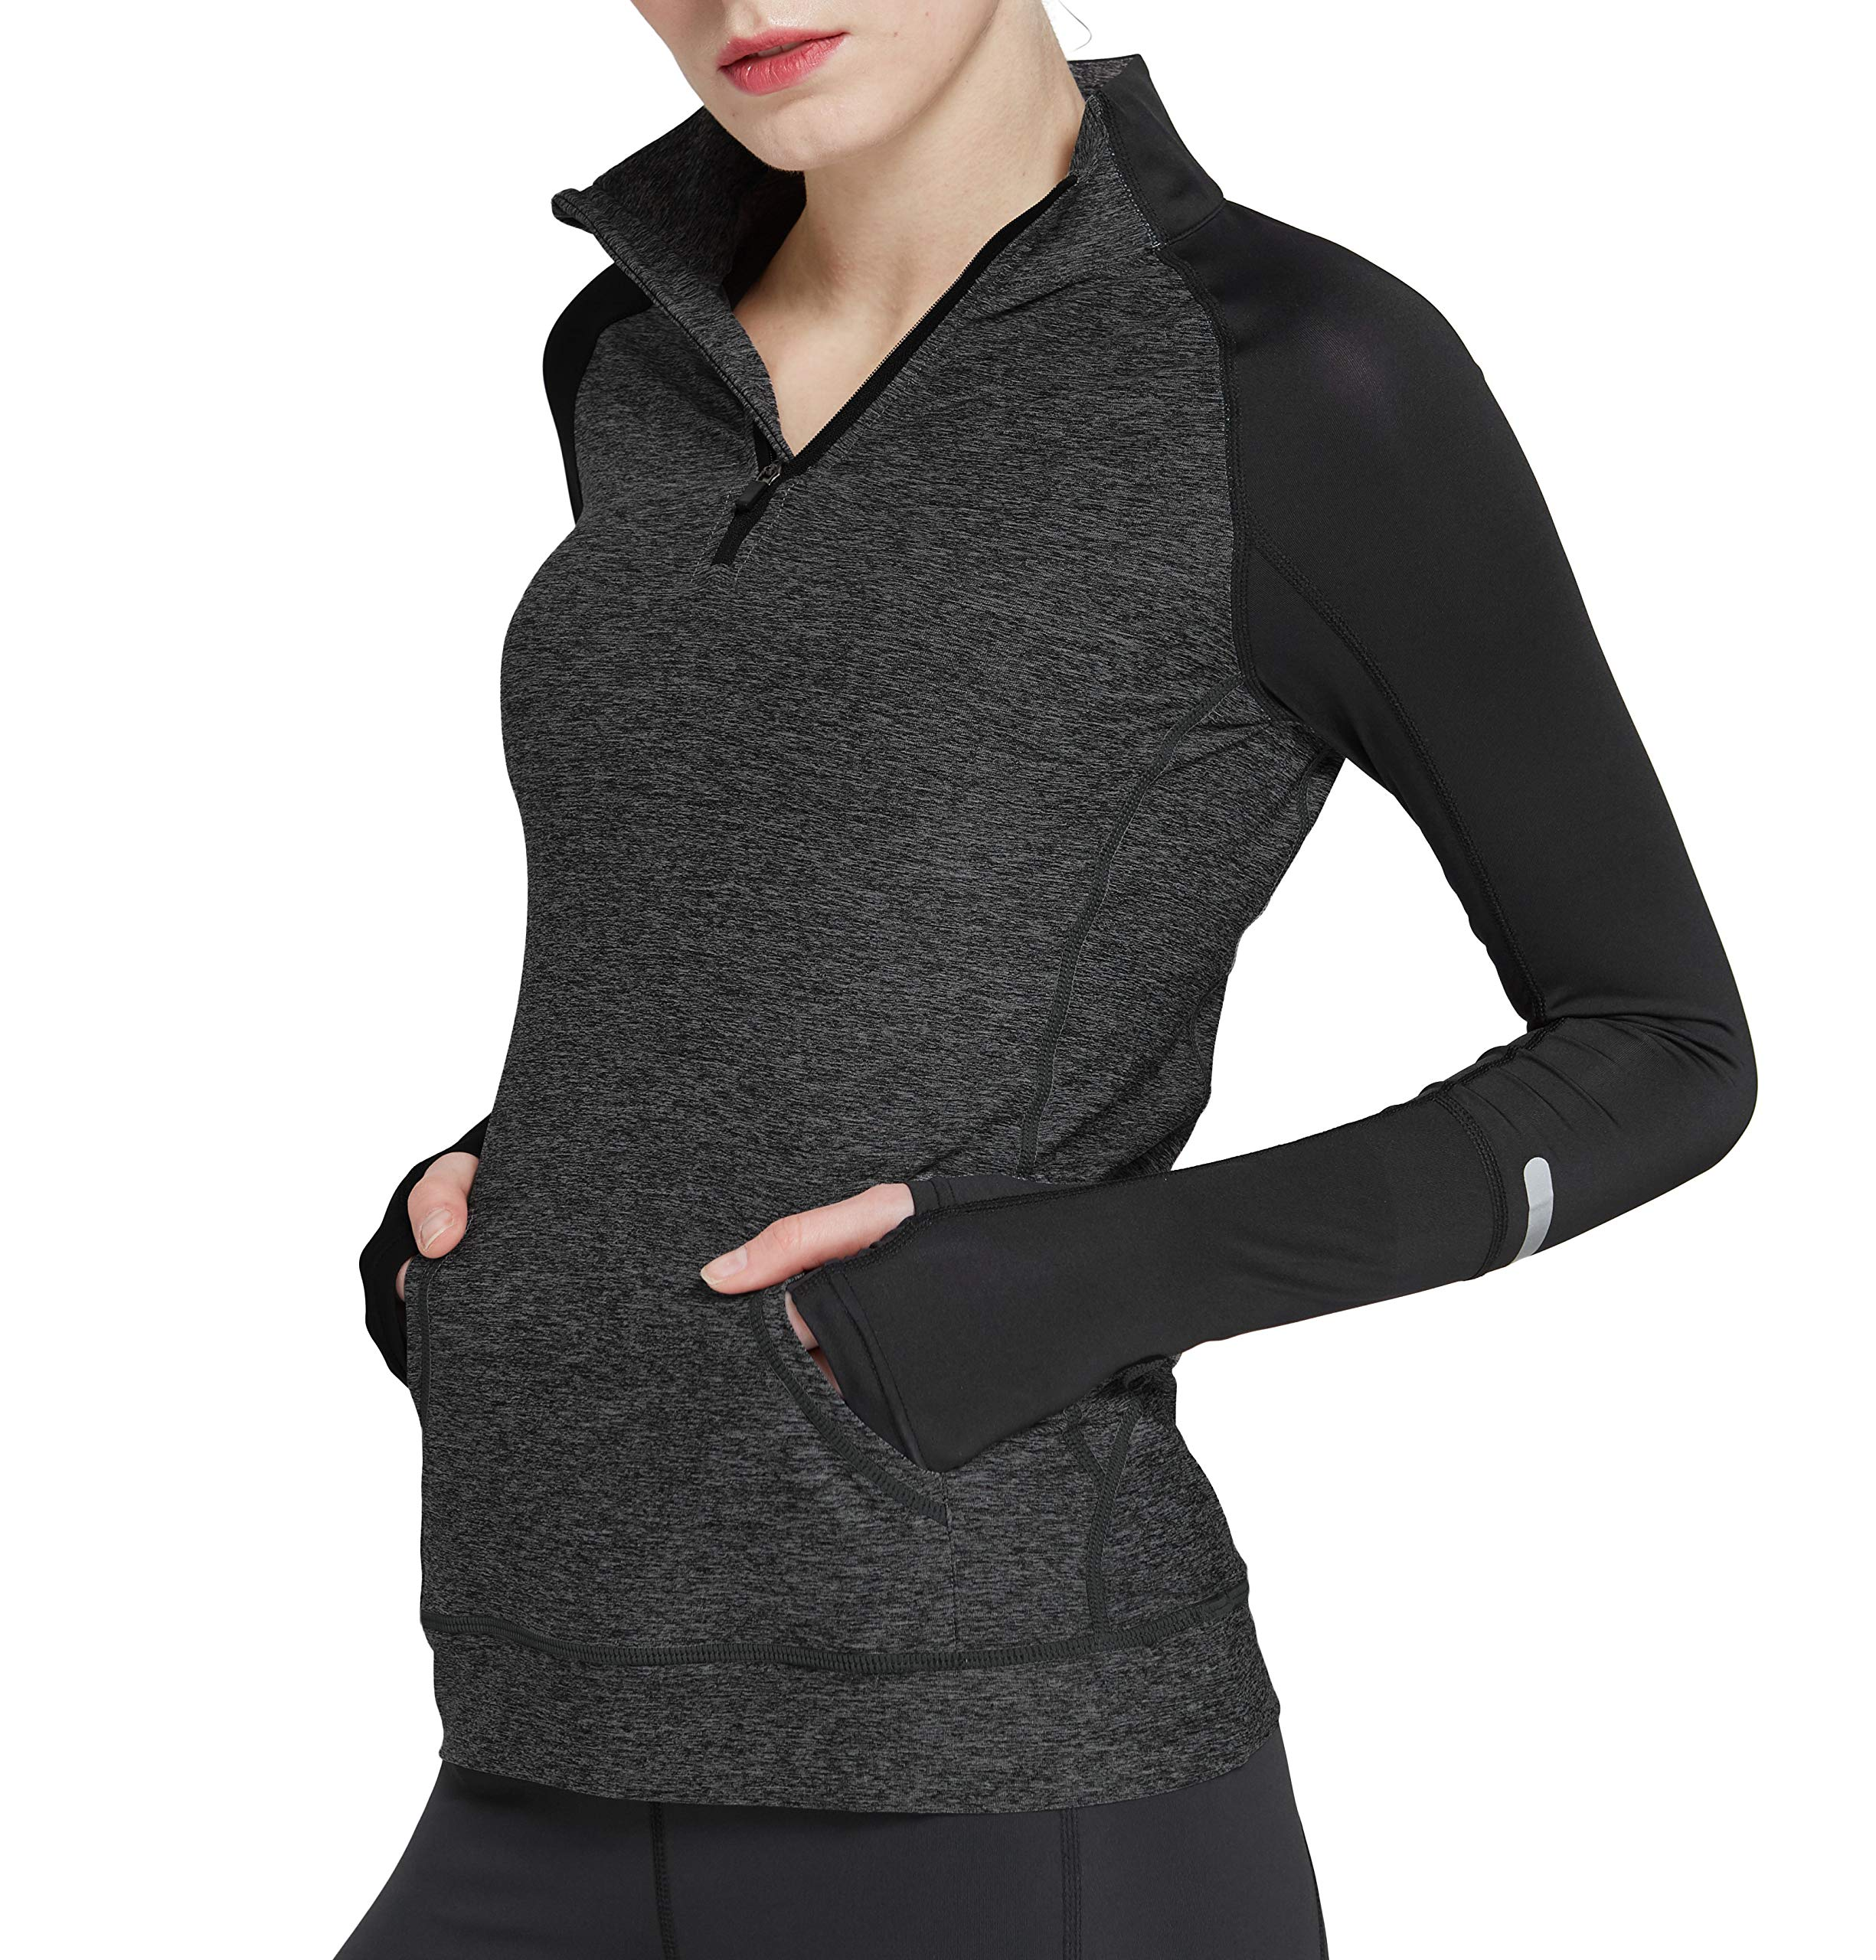 Women's Yoga Long Sleeves Half Zip Sweatshirt Girl Athletic Workout Running Jacket d_gy m Deep Grey by Cityoung